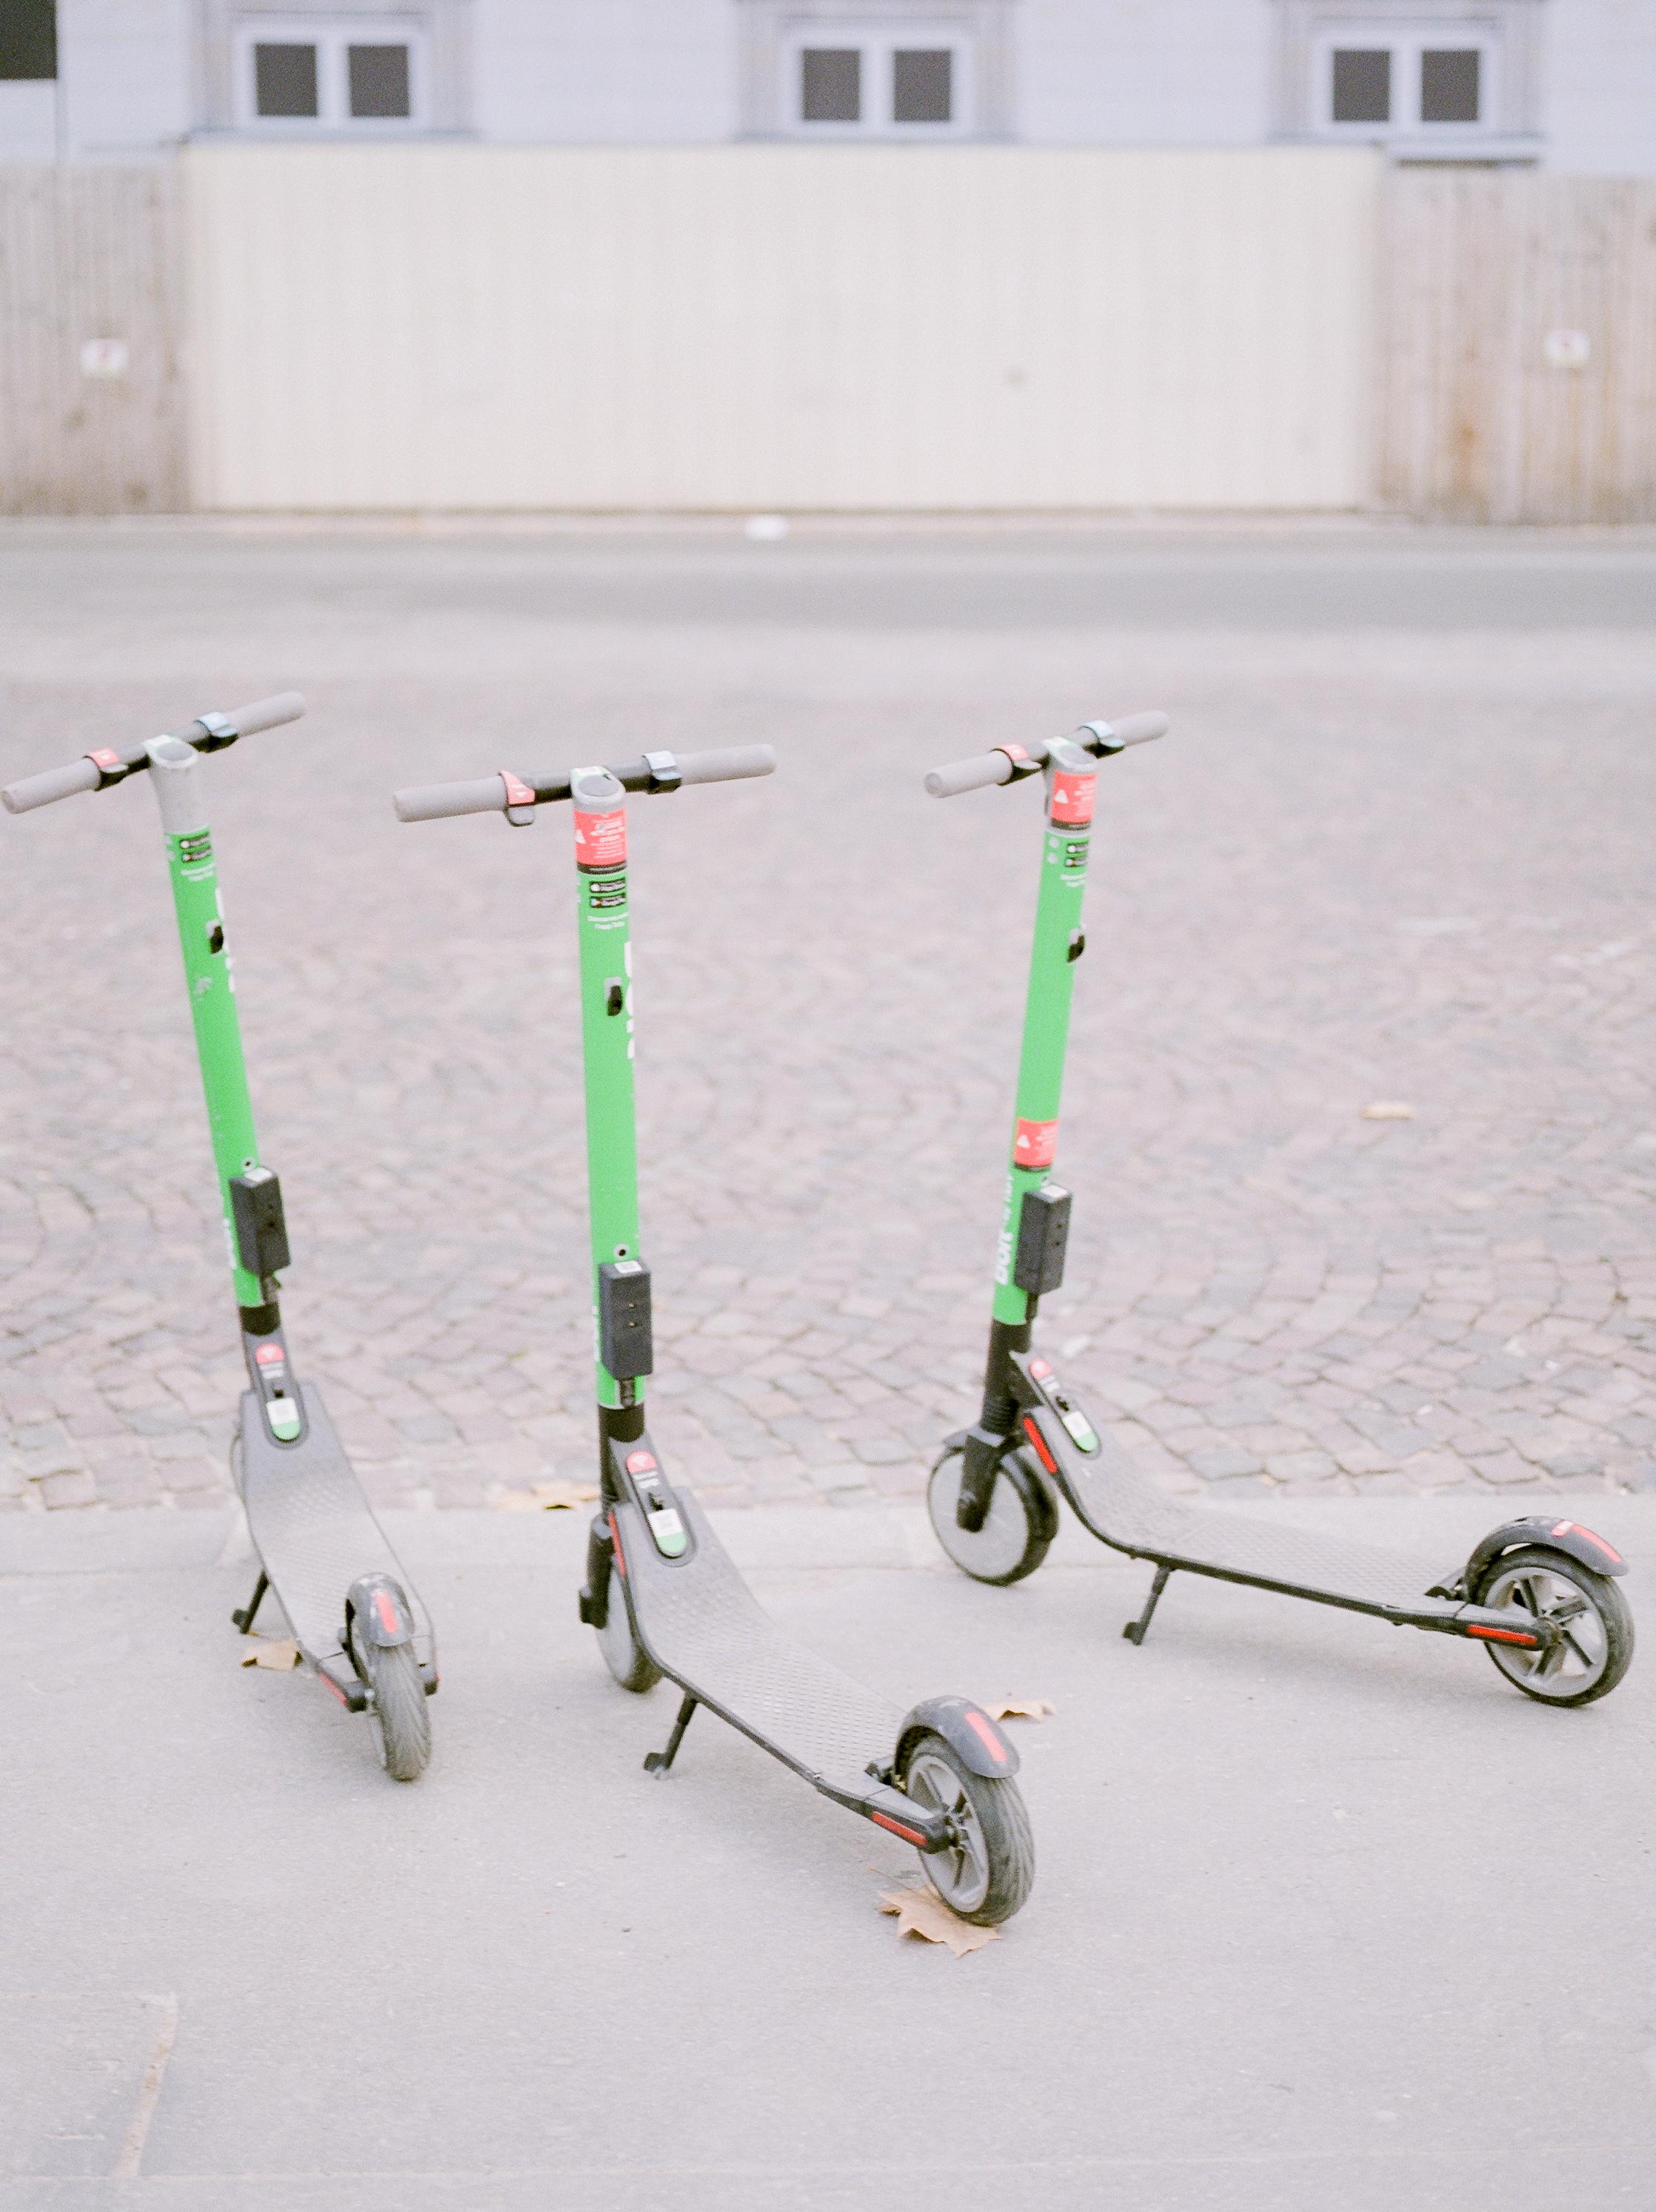 bird-scooters-paris-france.jpg